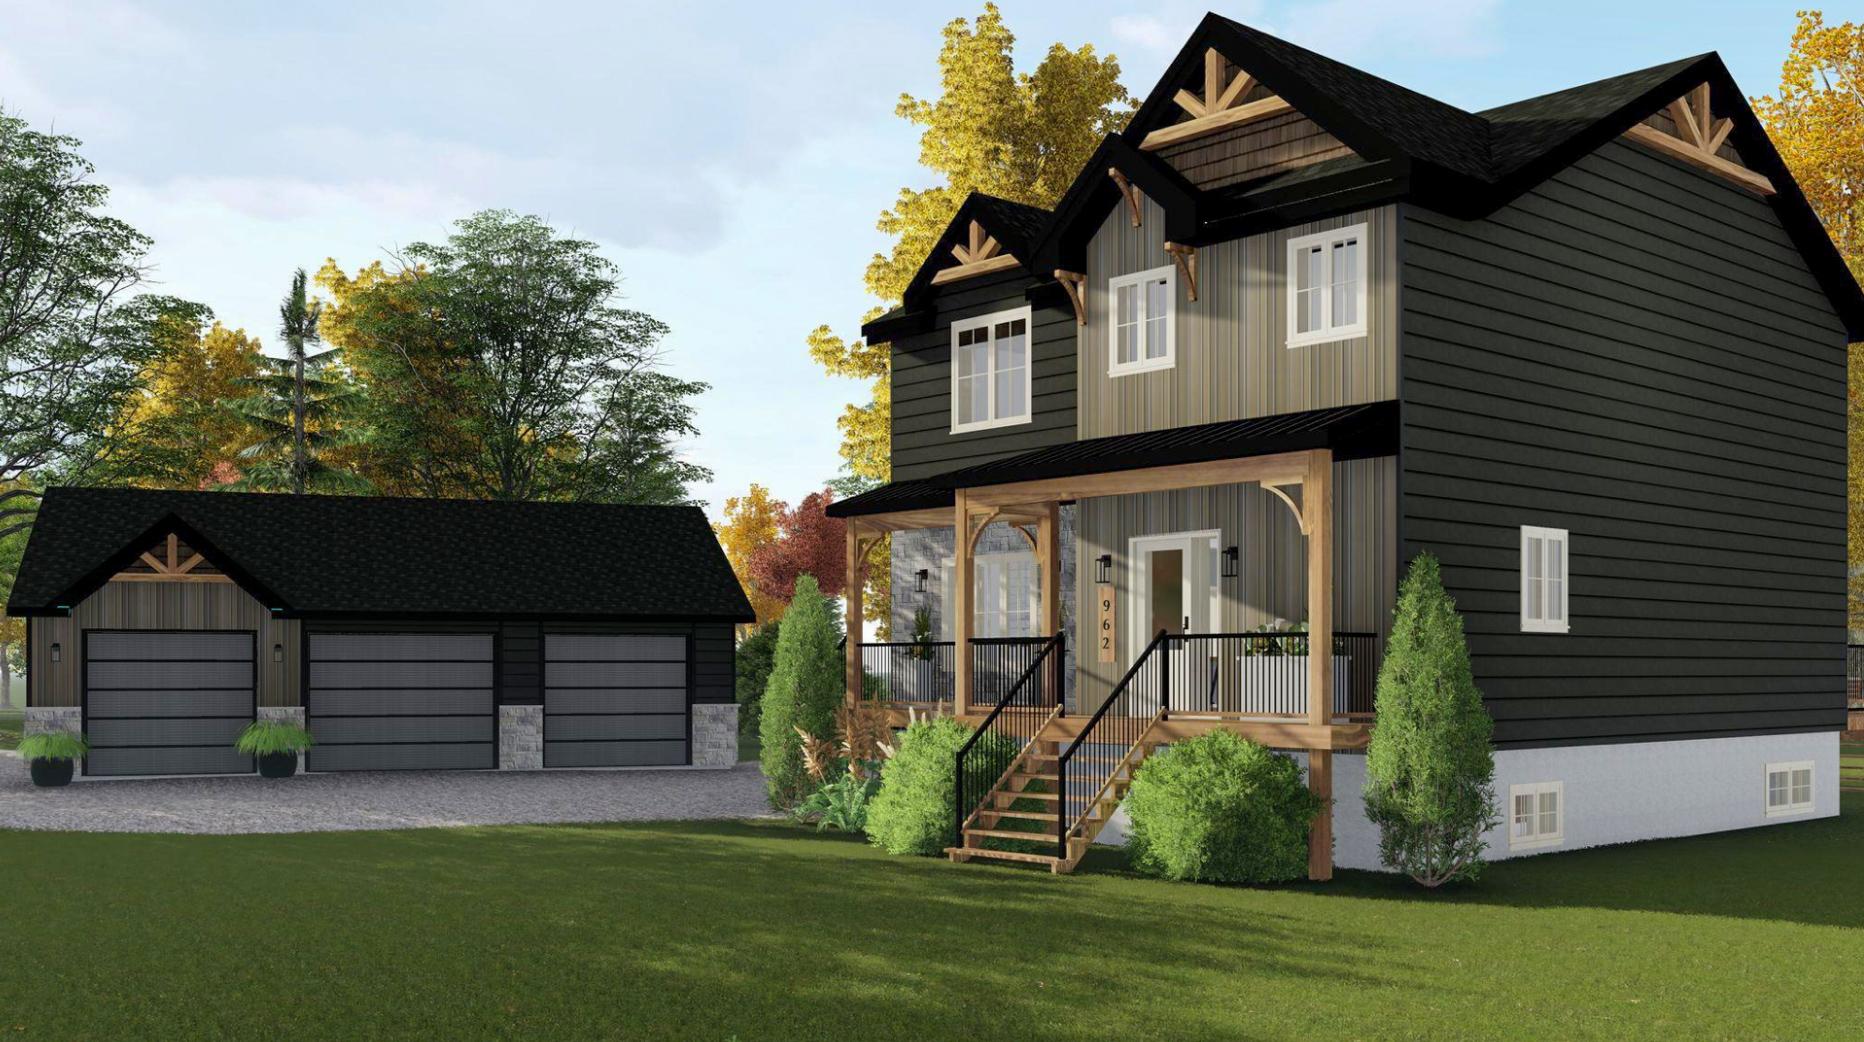 Réalisation Le cottage garage -modélisation 3D Struktura